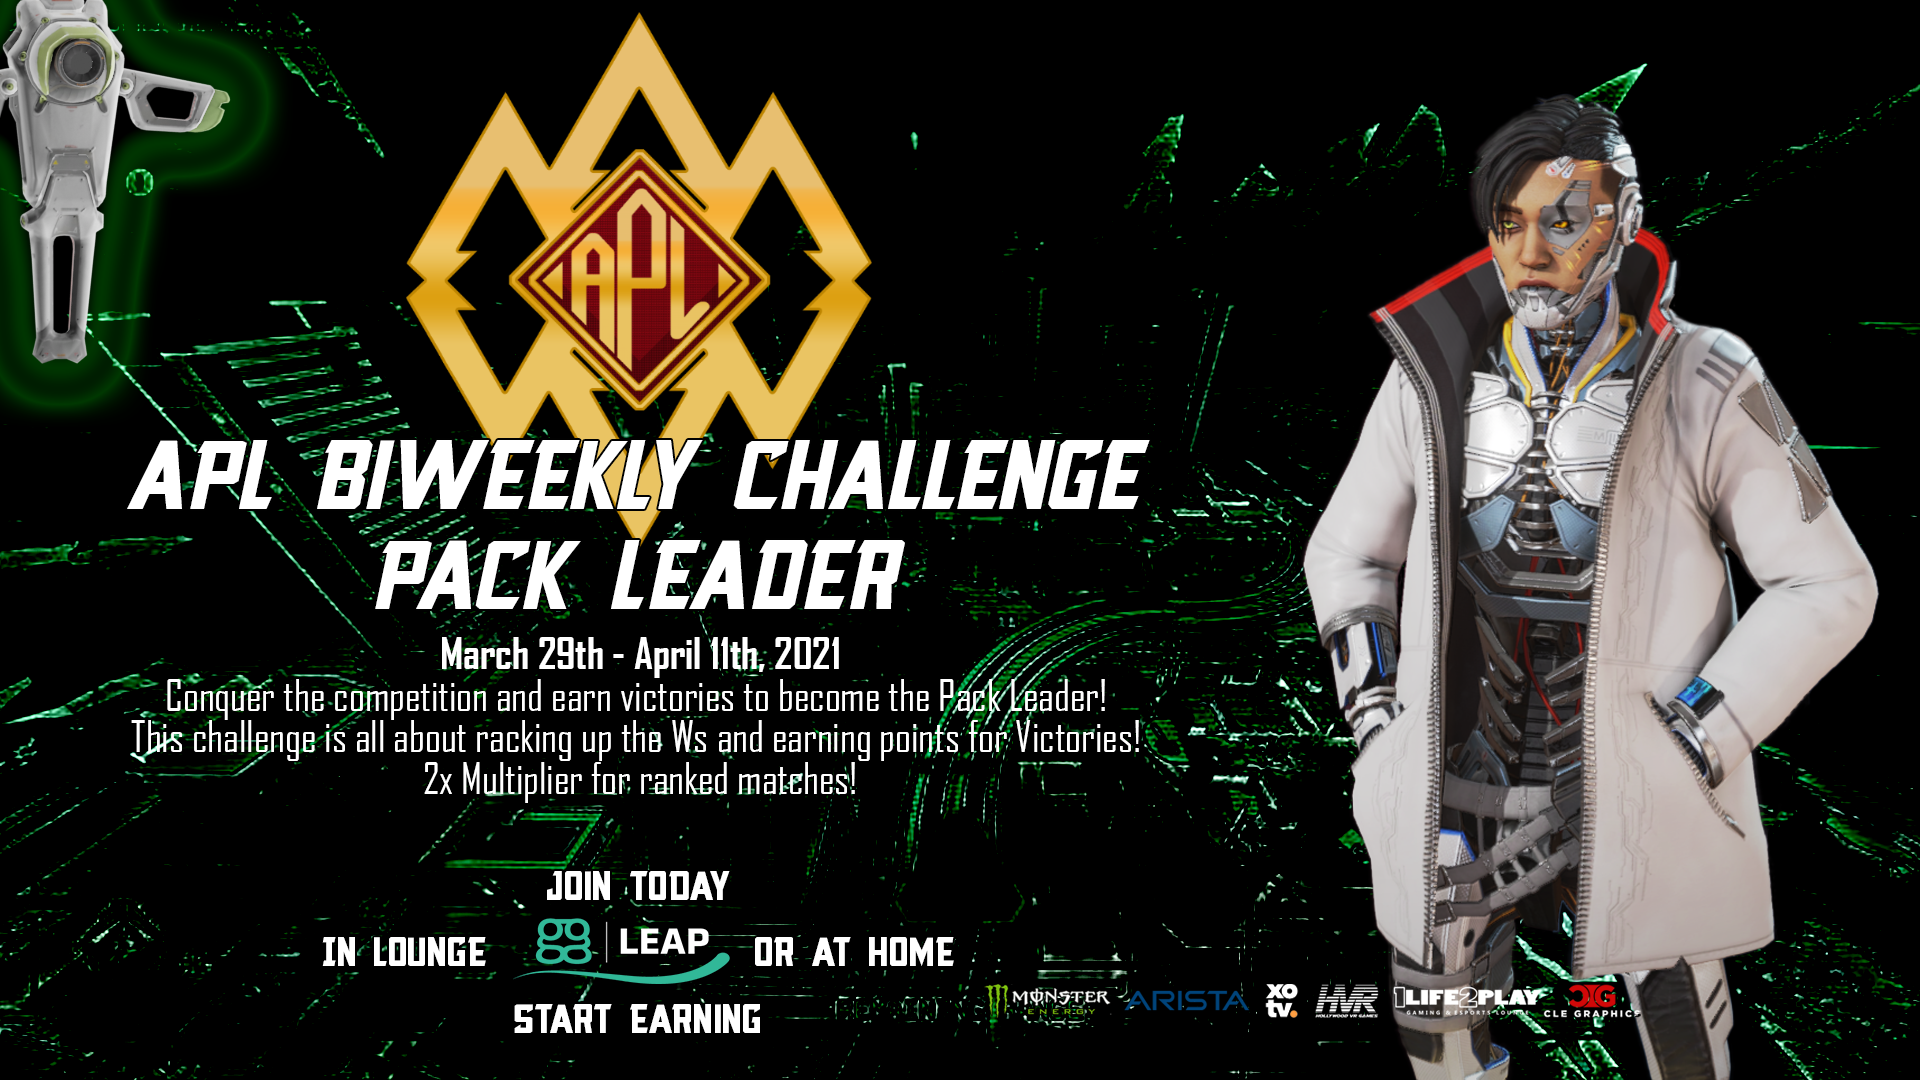 - APL Biweekly Challenge Pack Leader 3 - Apex Predator League presented by 1Life2Play fueled by Monster Energy